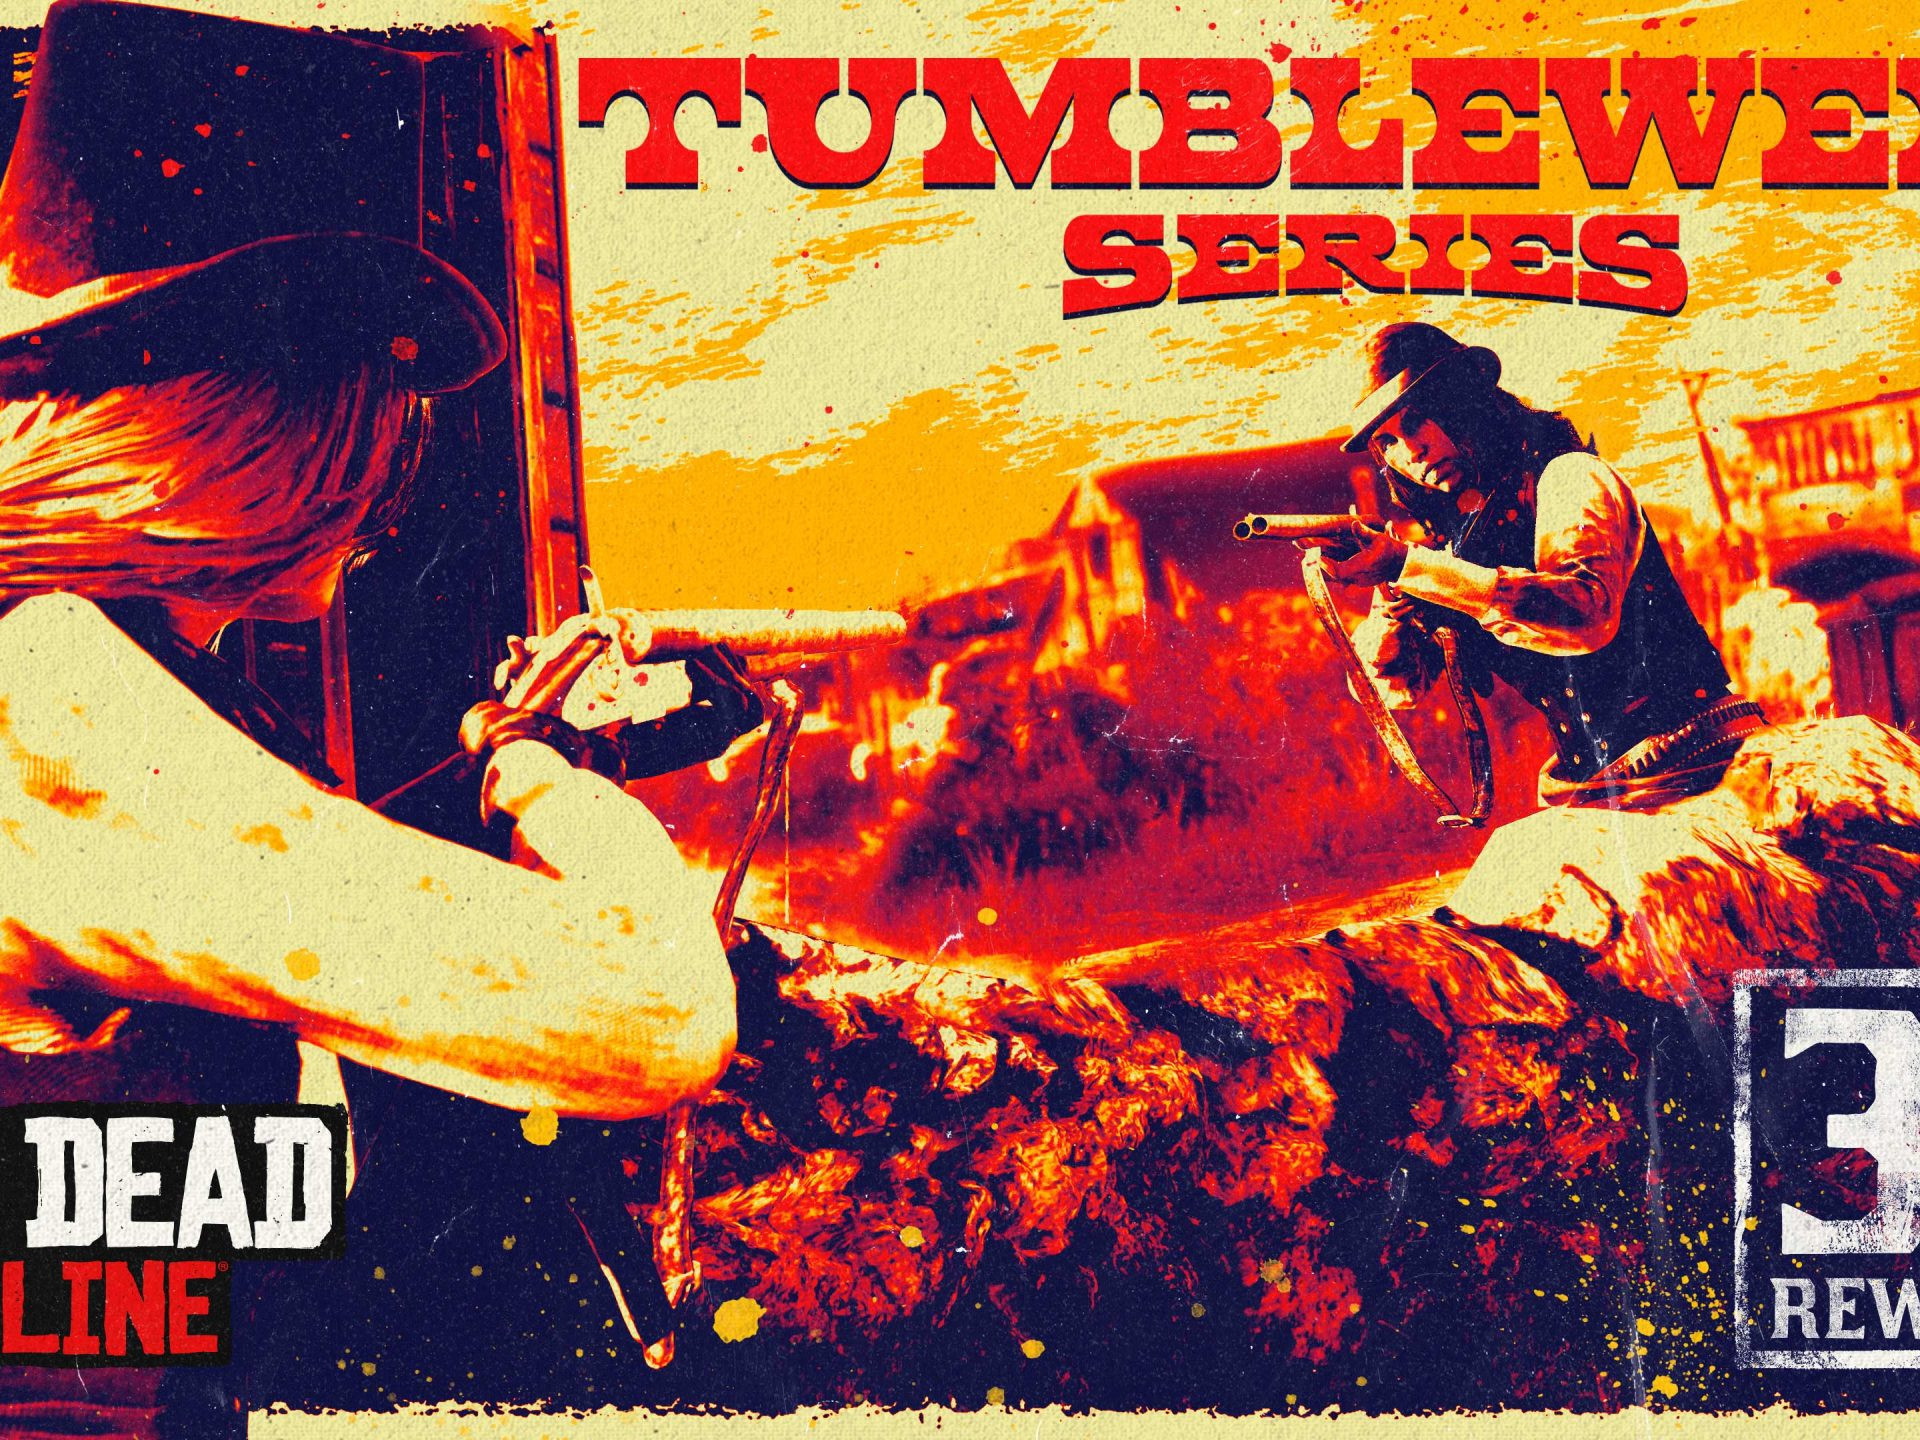 Serie Tumbleweed